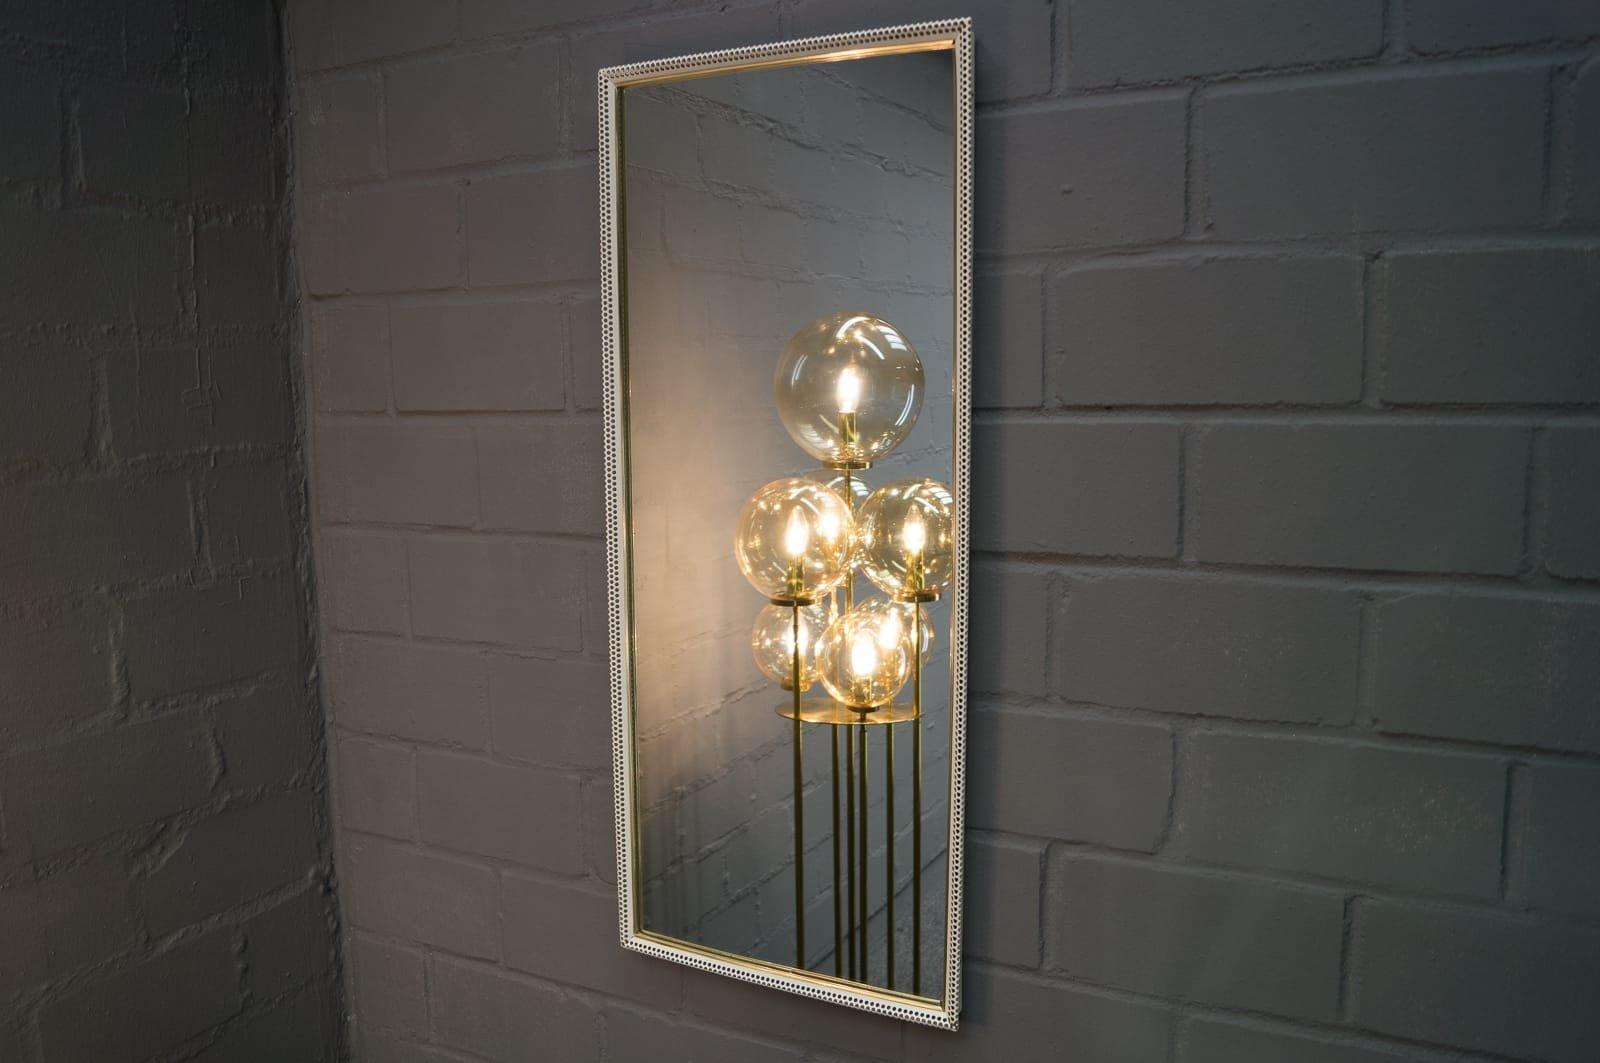 Grand miroir mural rectangulaire en m tal perfor peint de for Grand miroir mural salon